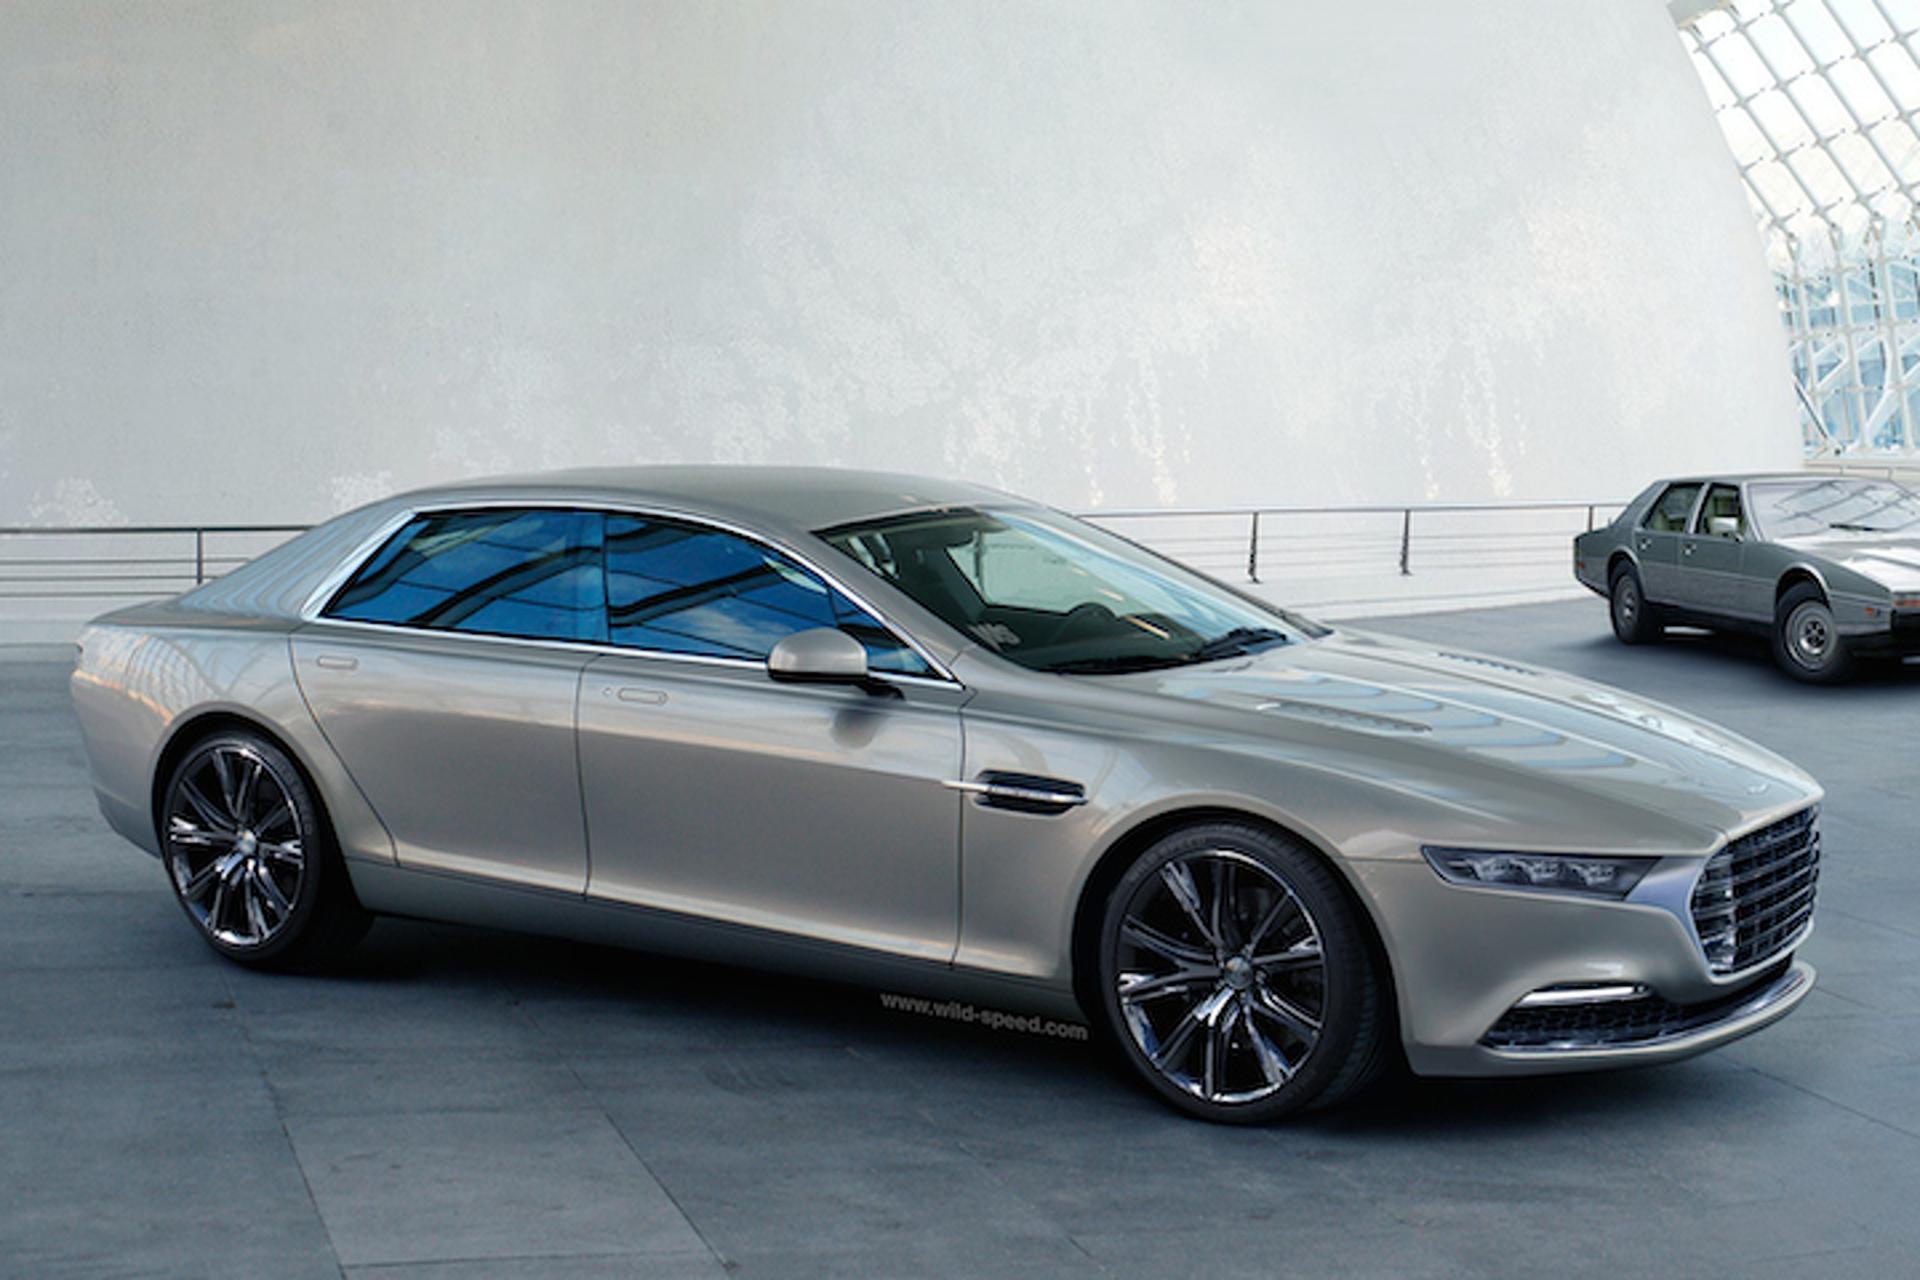 Aston Martin Lagonda Sedan Could Be Built This Year